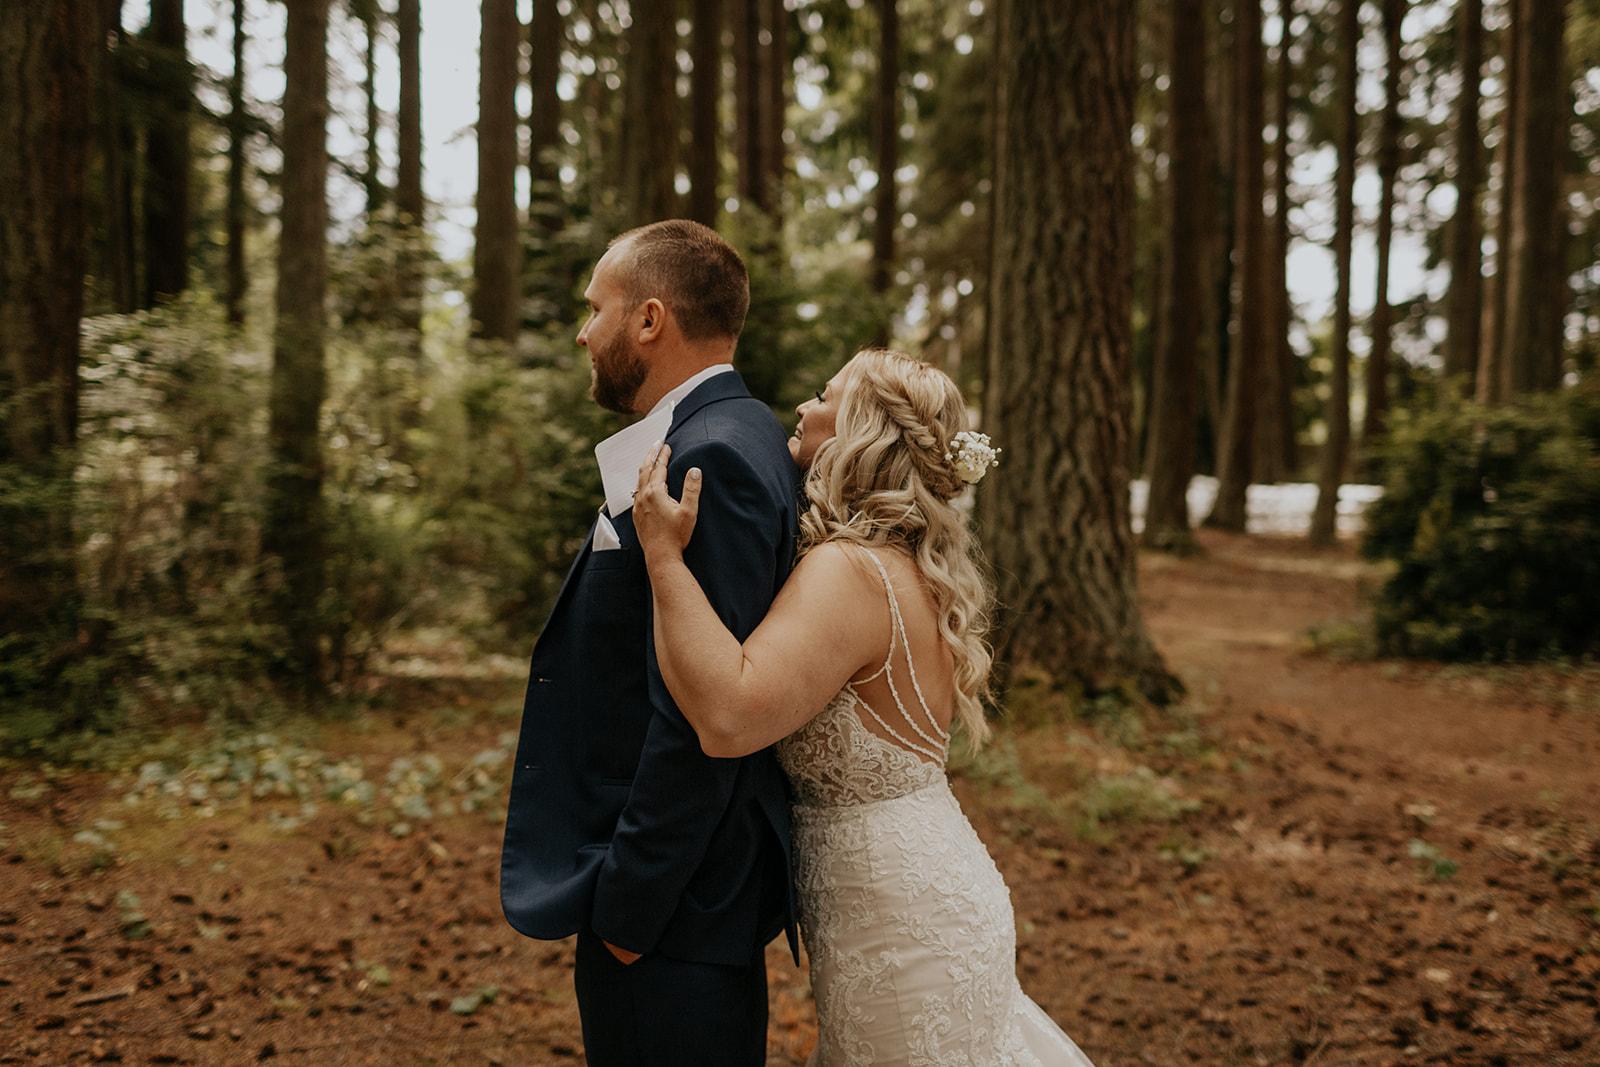 ginapaulson_shannonandbrandonwedding-159.jpg